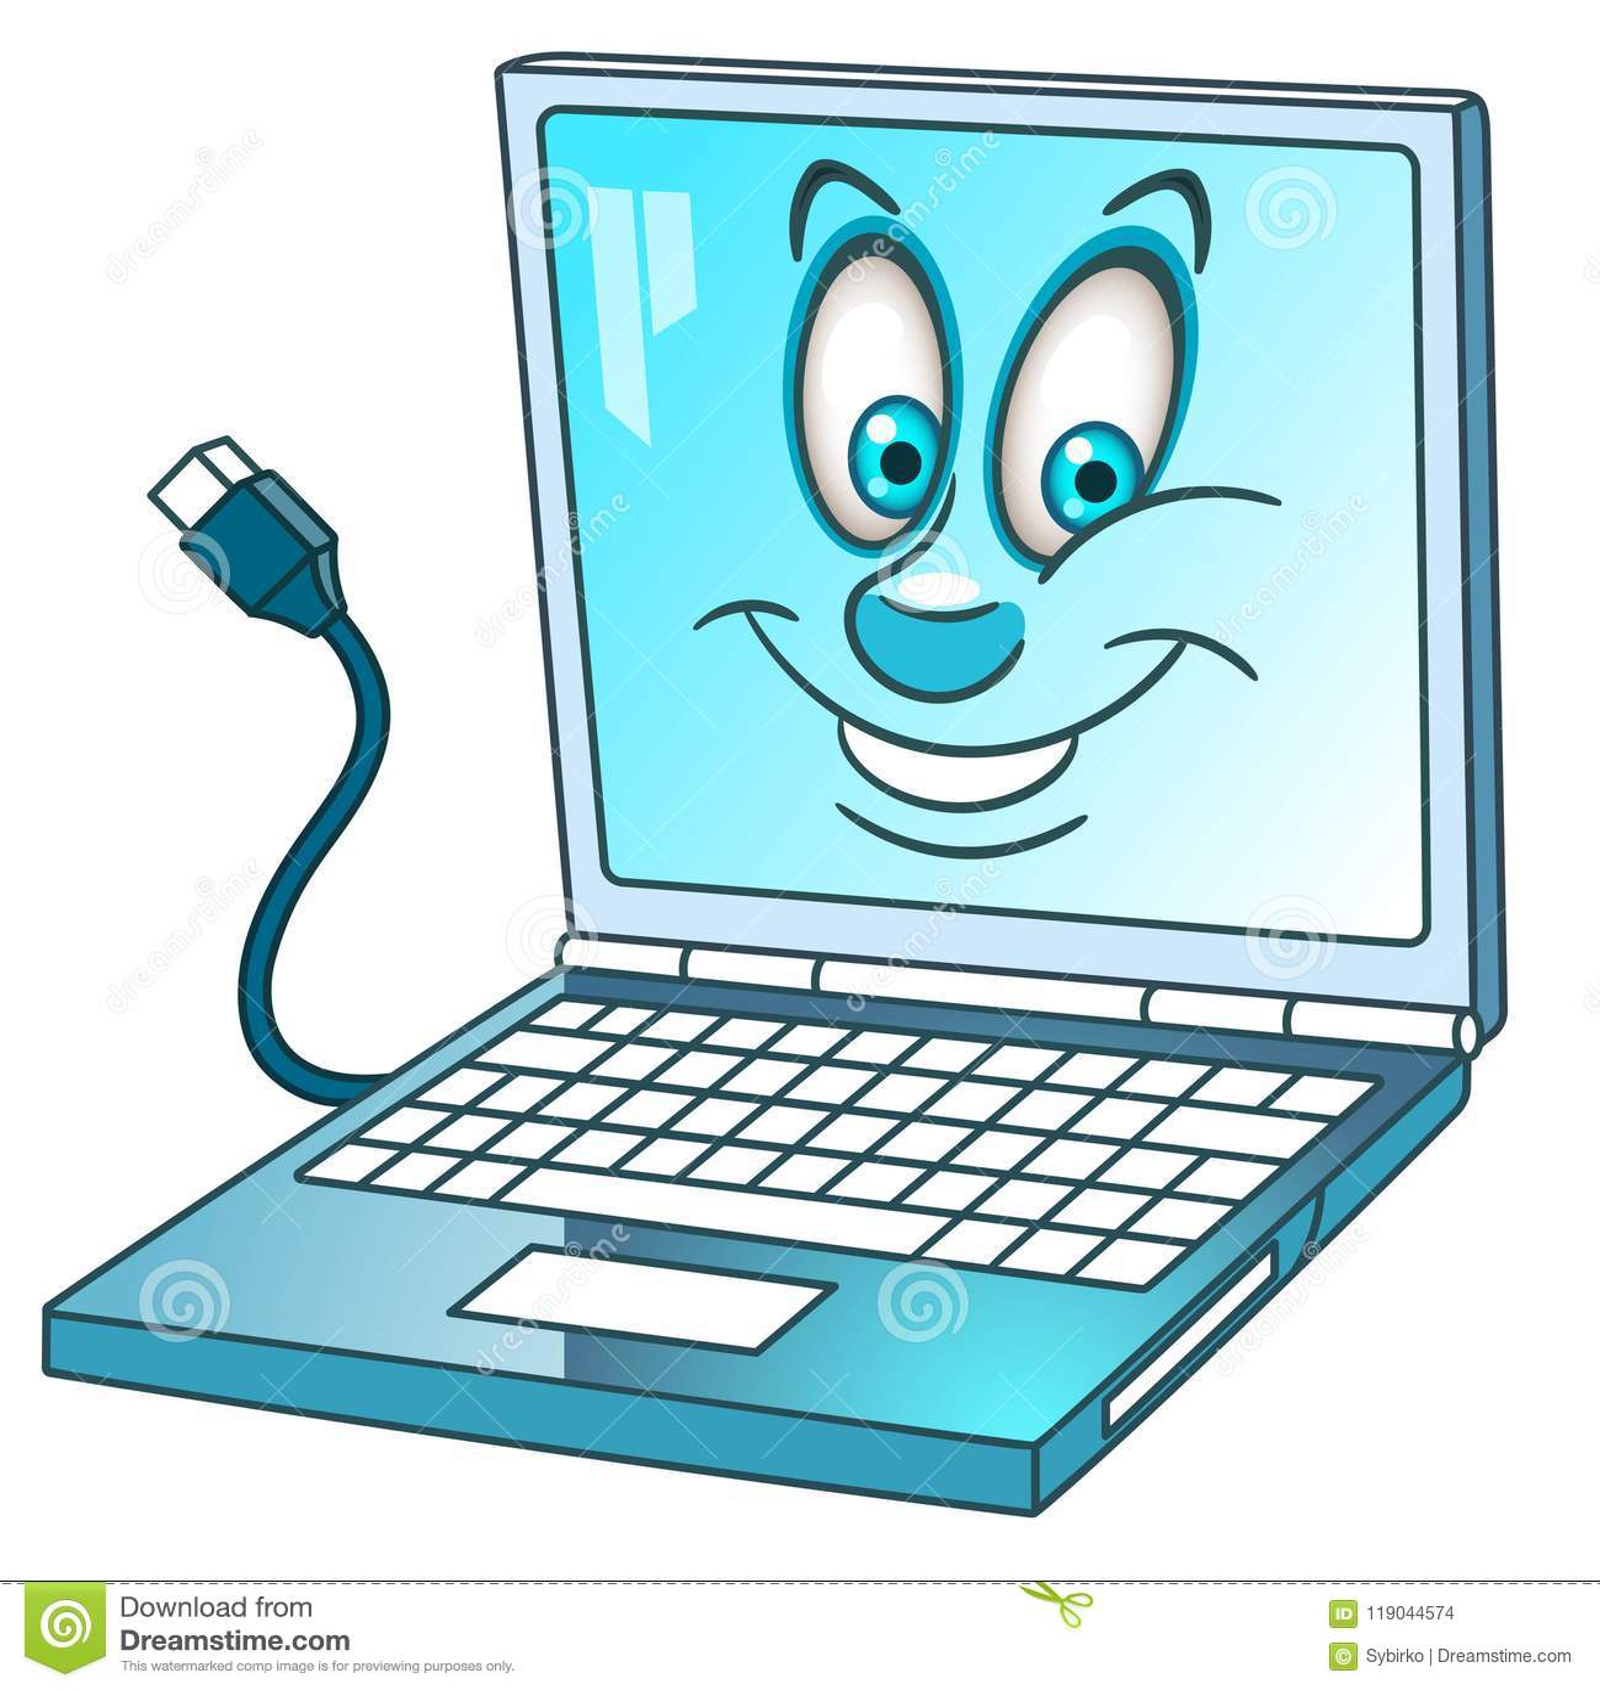 Cartoon Laptop Or Notebook Computer Stock Vector - Illustration of ...